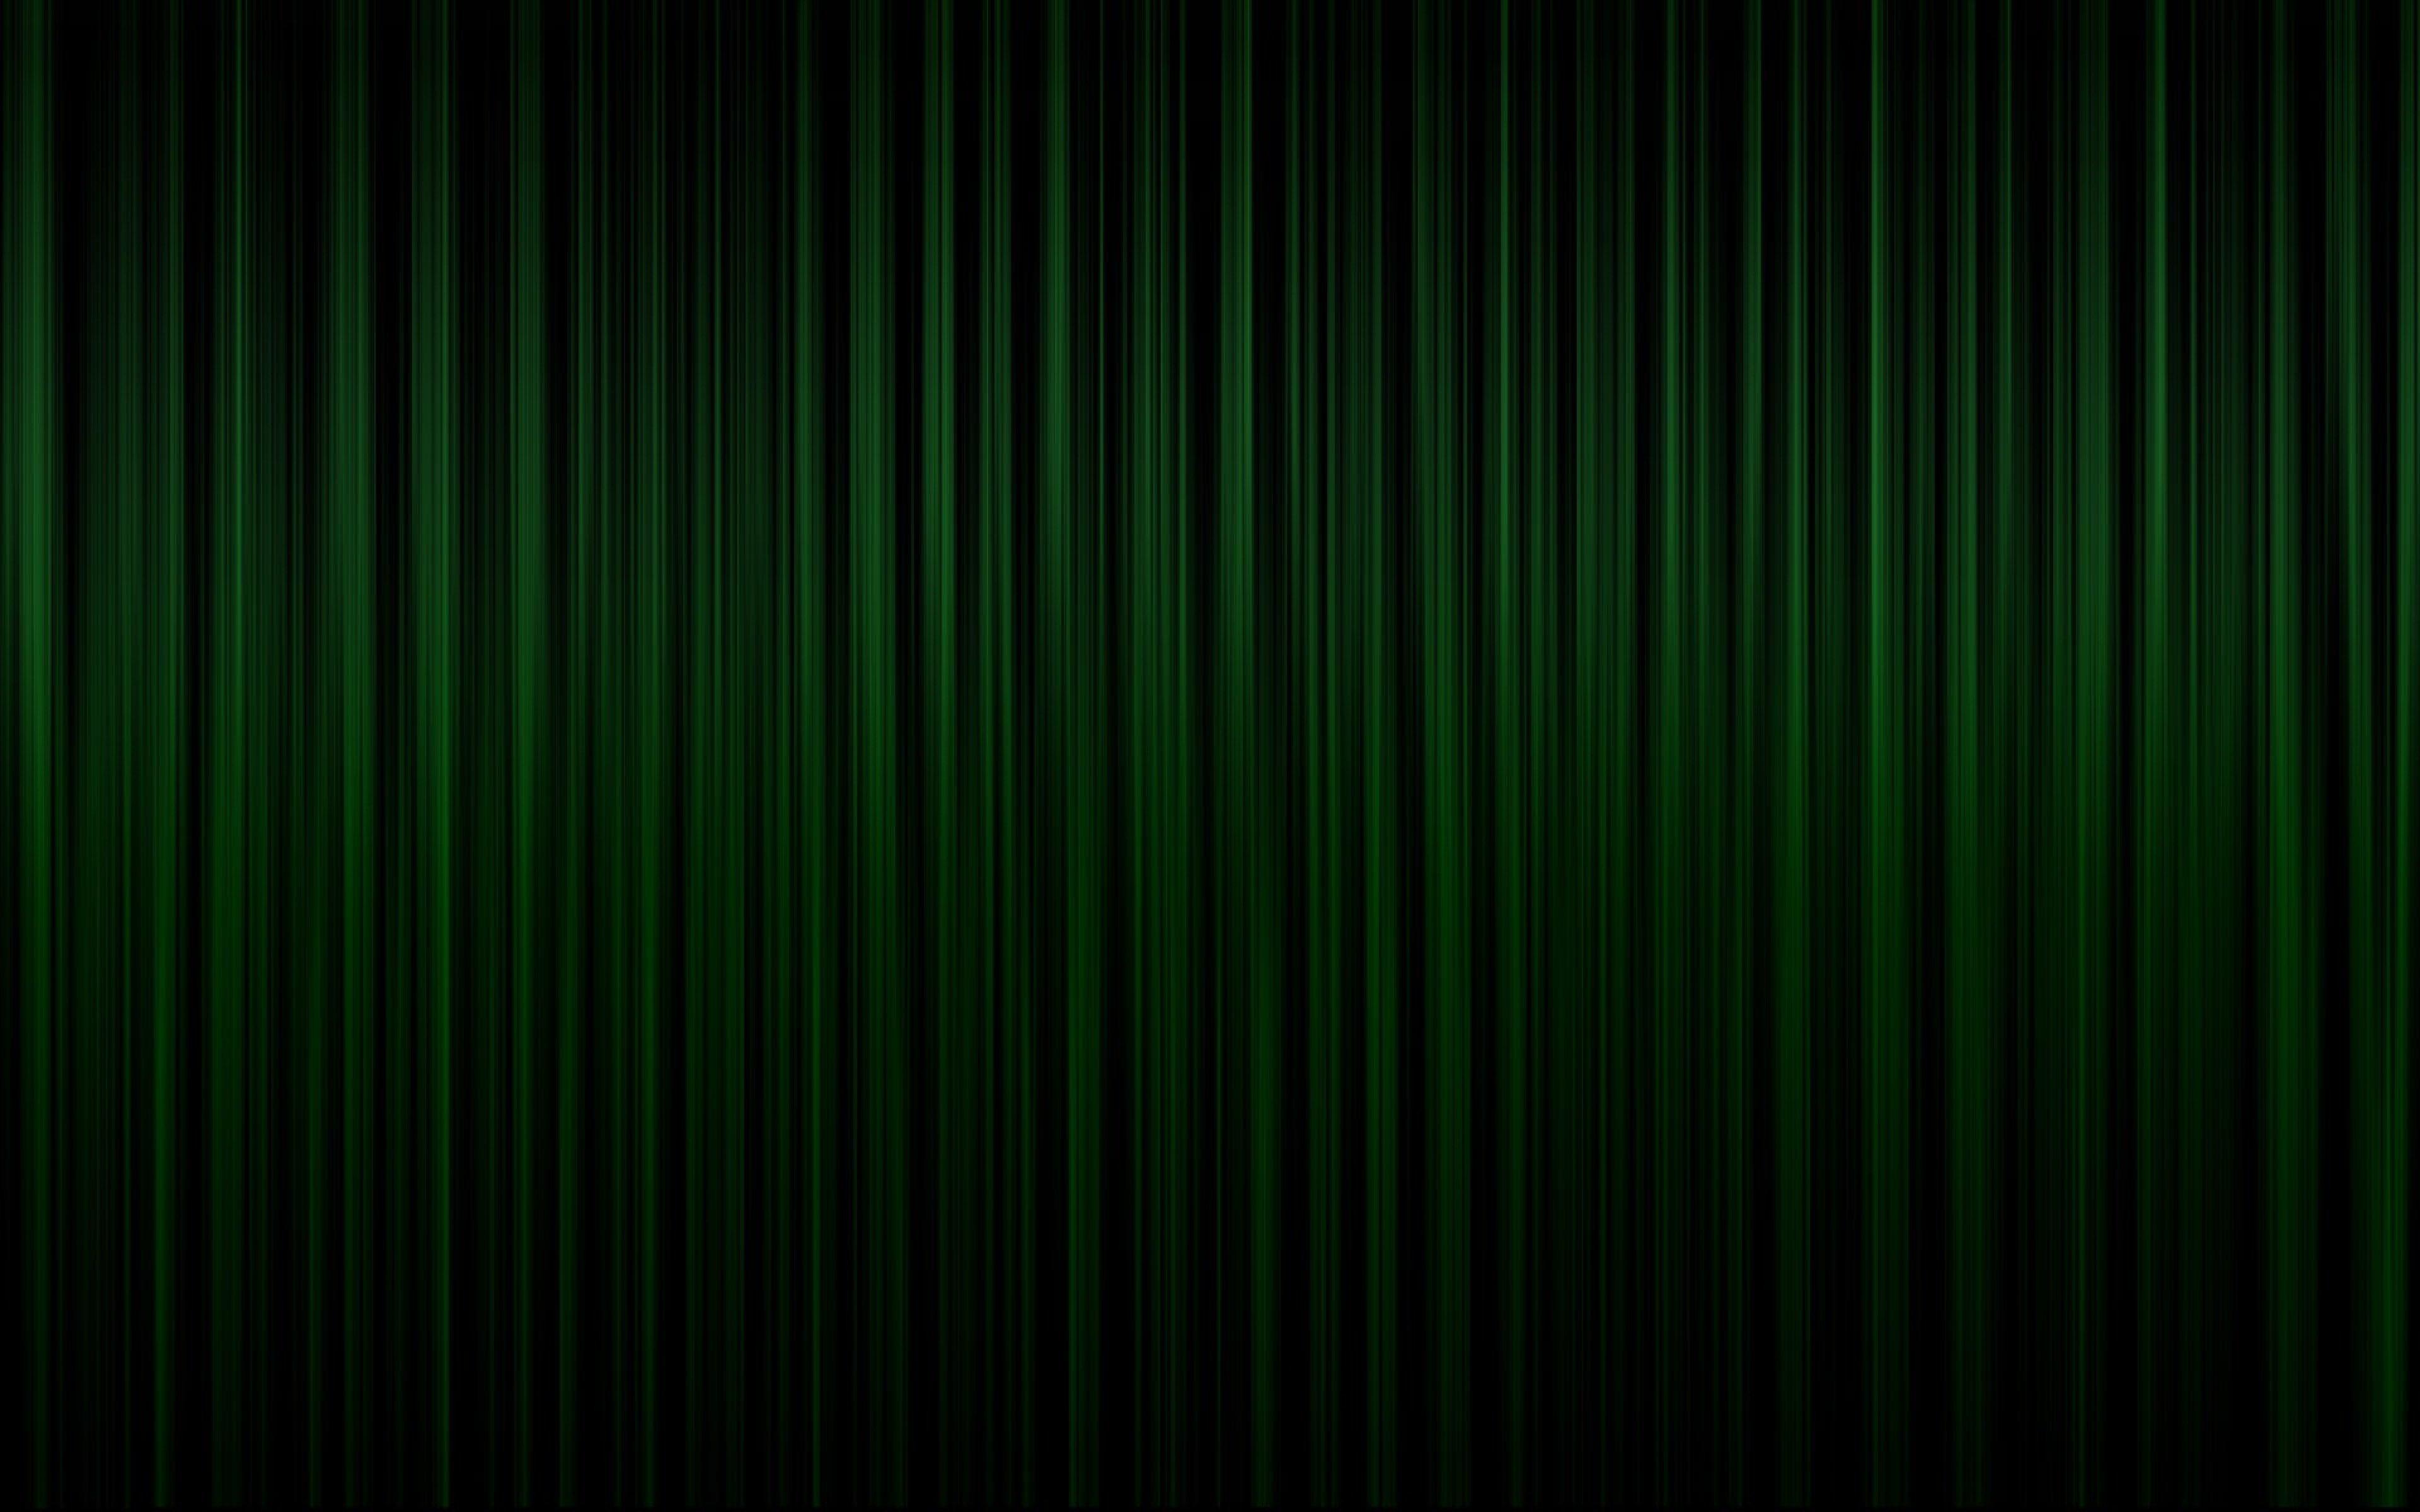 vertical wallpapers 4k abstract dark fondo verde oscuro shadow lines texture wallpapersafari pantalla swirls ultra multicolor stripes lights brightness spectrum